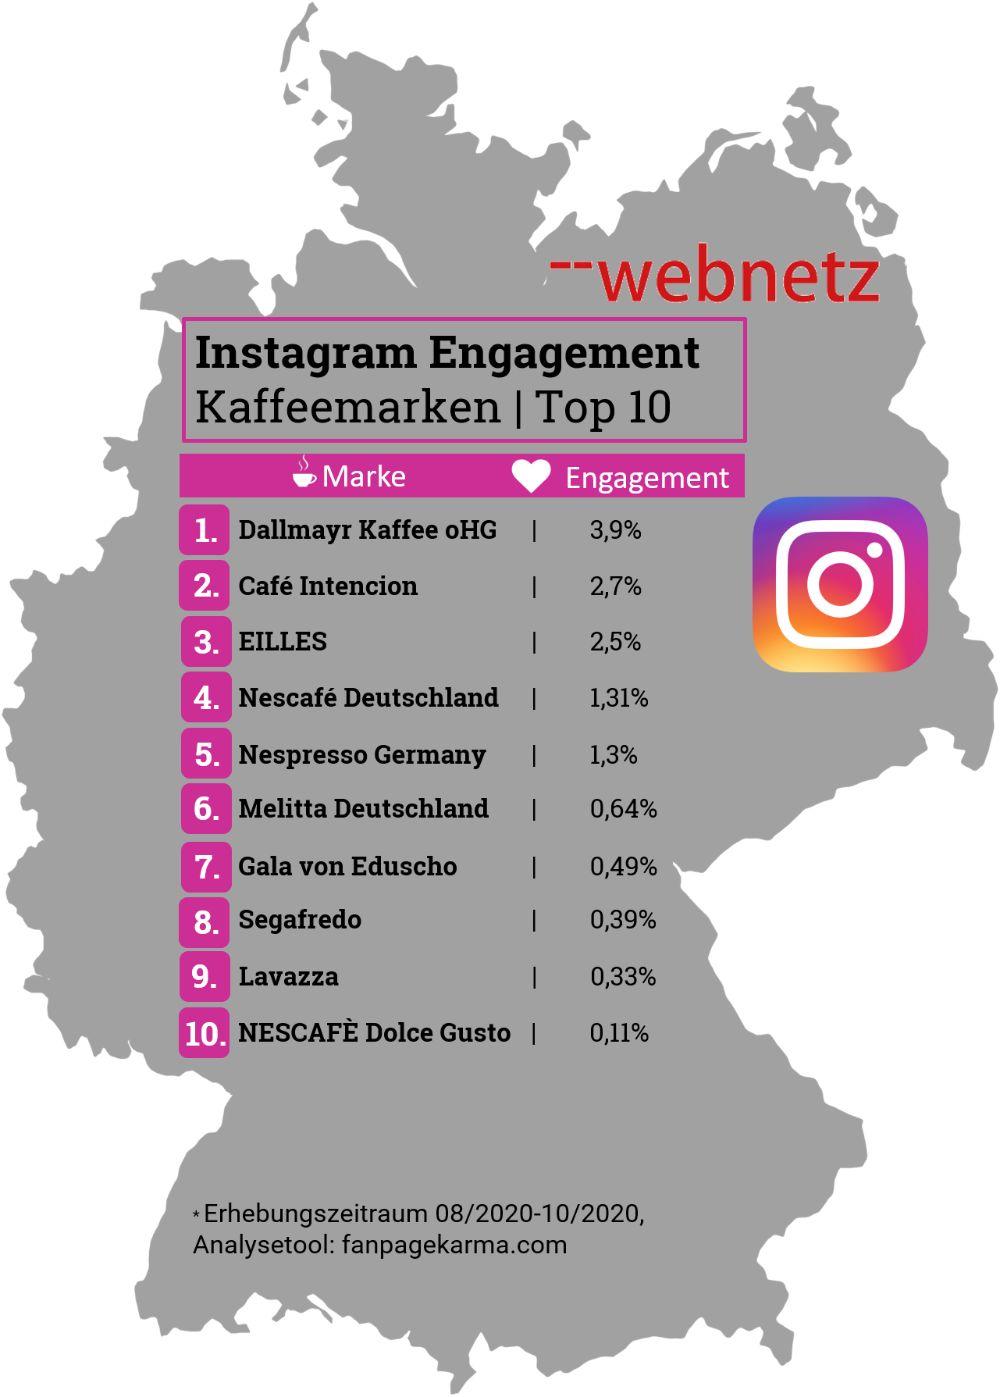 Instagram Engagement Top 10 Kaffeemarken